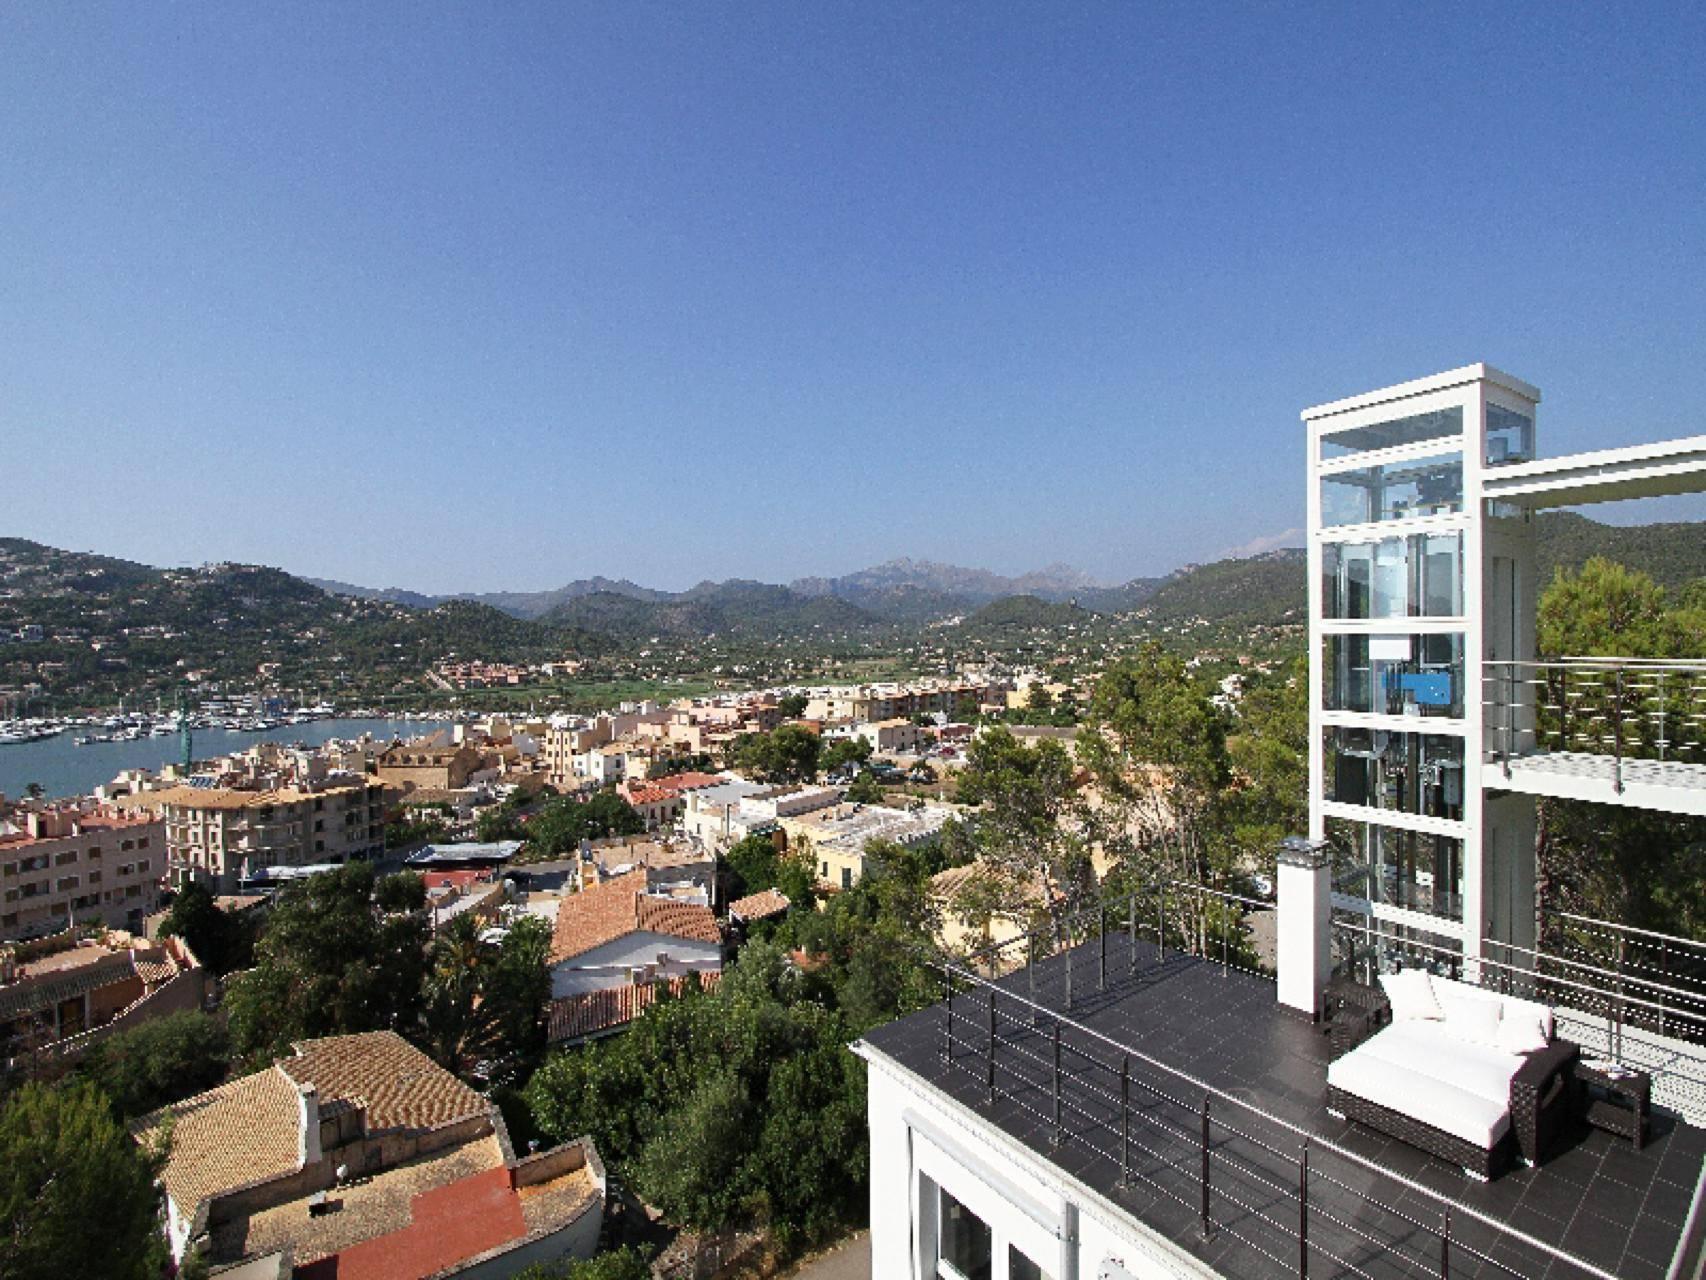 01-04 Bauhaus Villa Mallorca Südwesten Bild 14